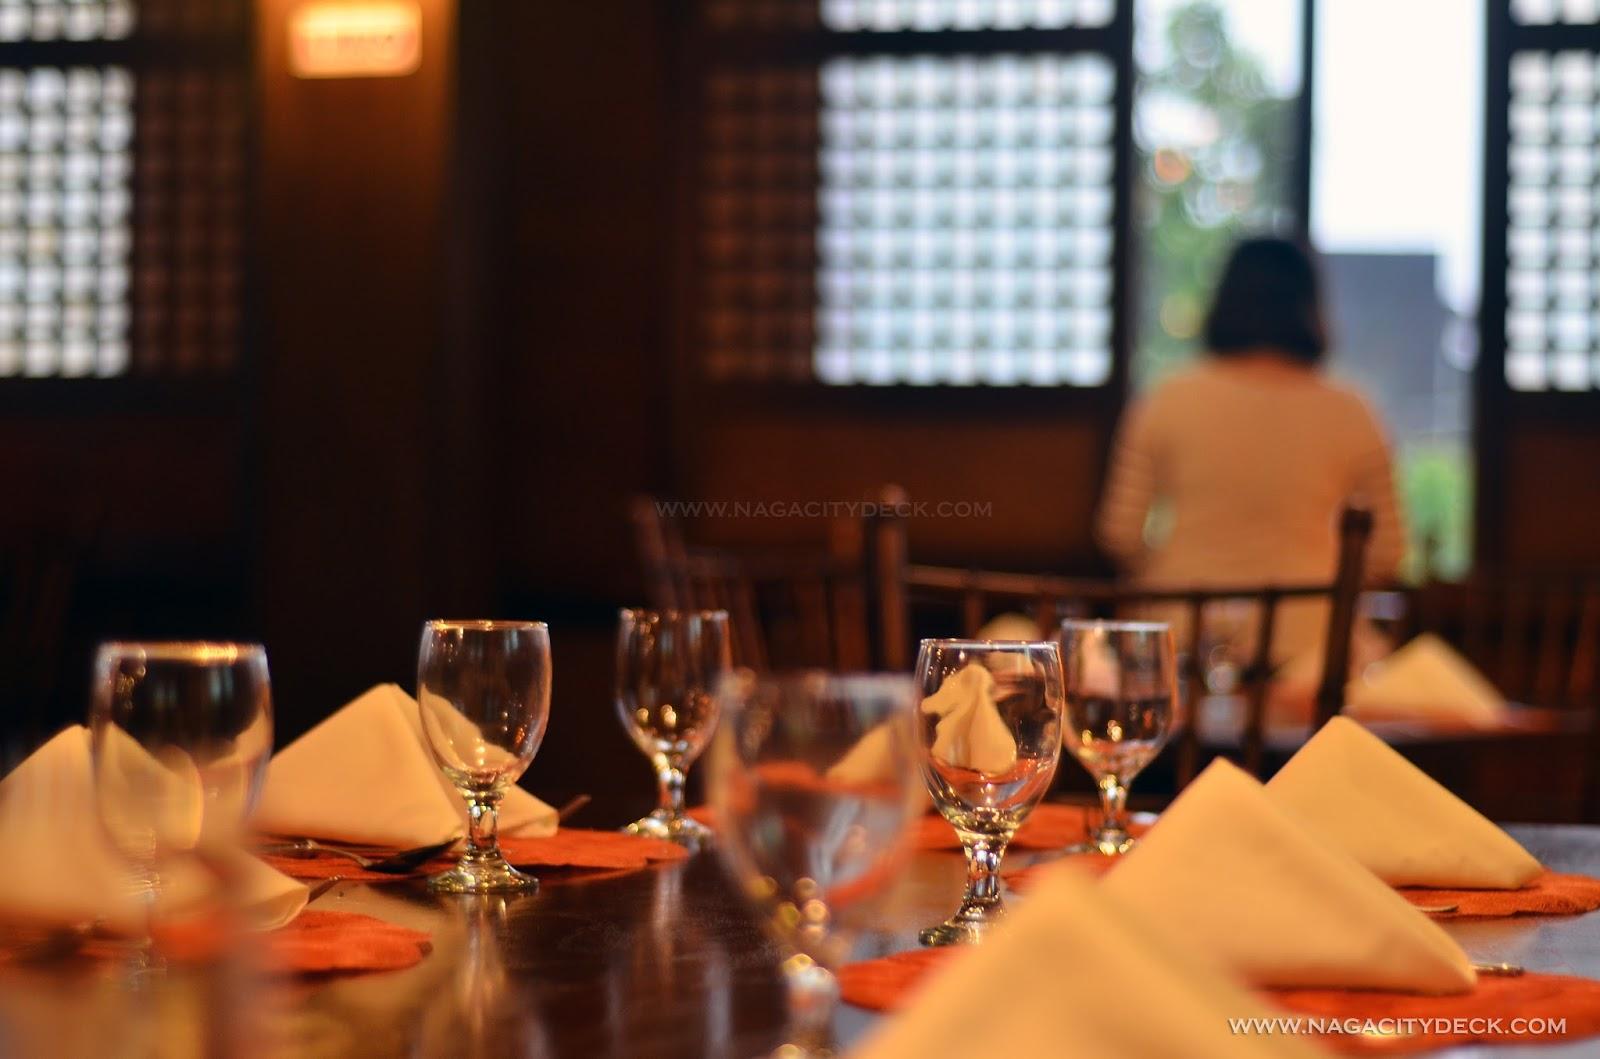 Where to eat in Albay: Balay Cena Una ~ Naga City Deck